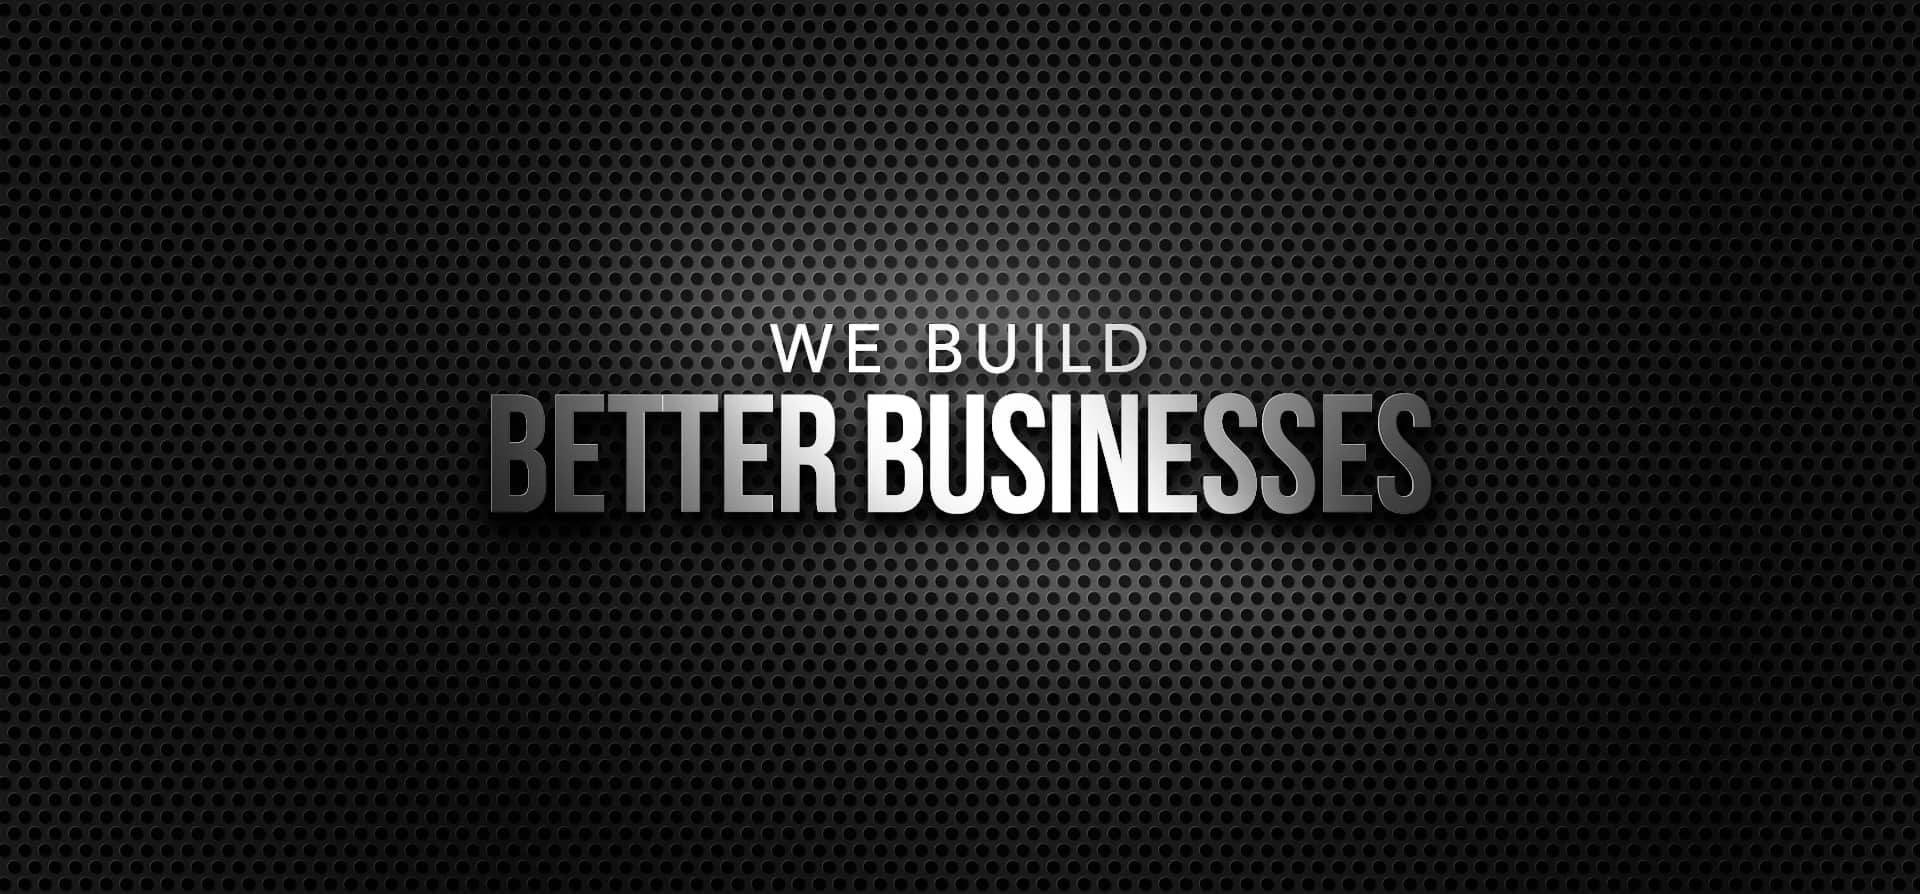 We Build Better Businesses